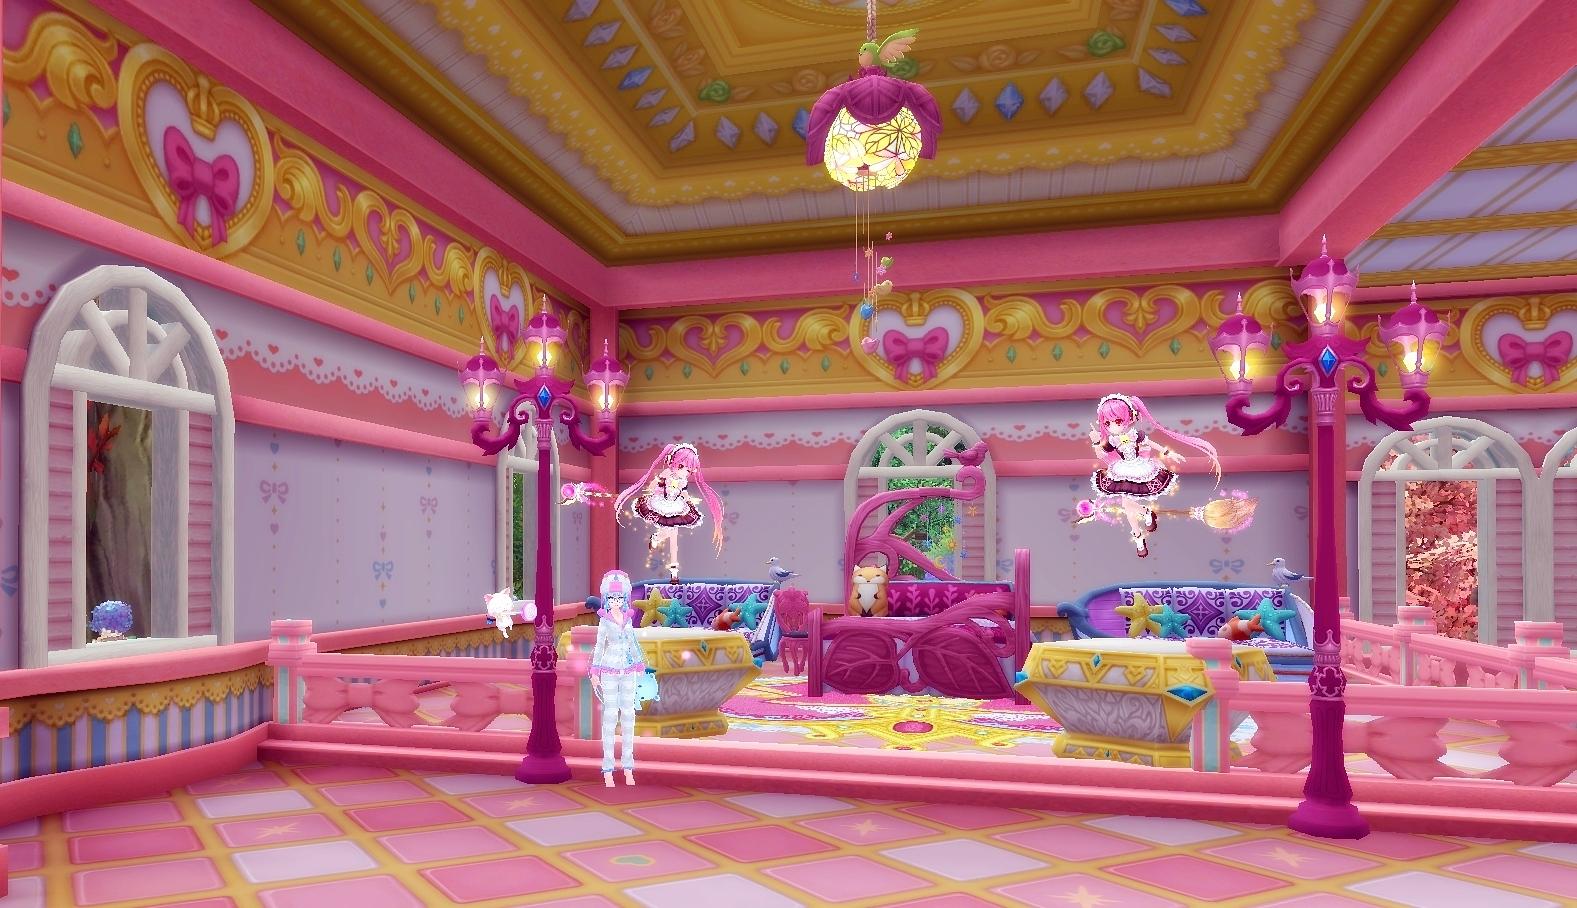 candyhousebedroom3.jpg